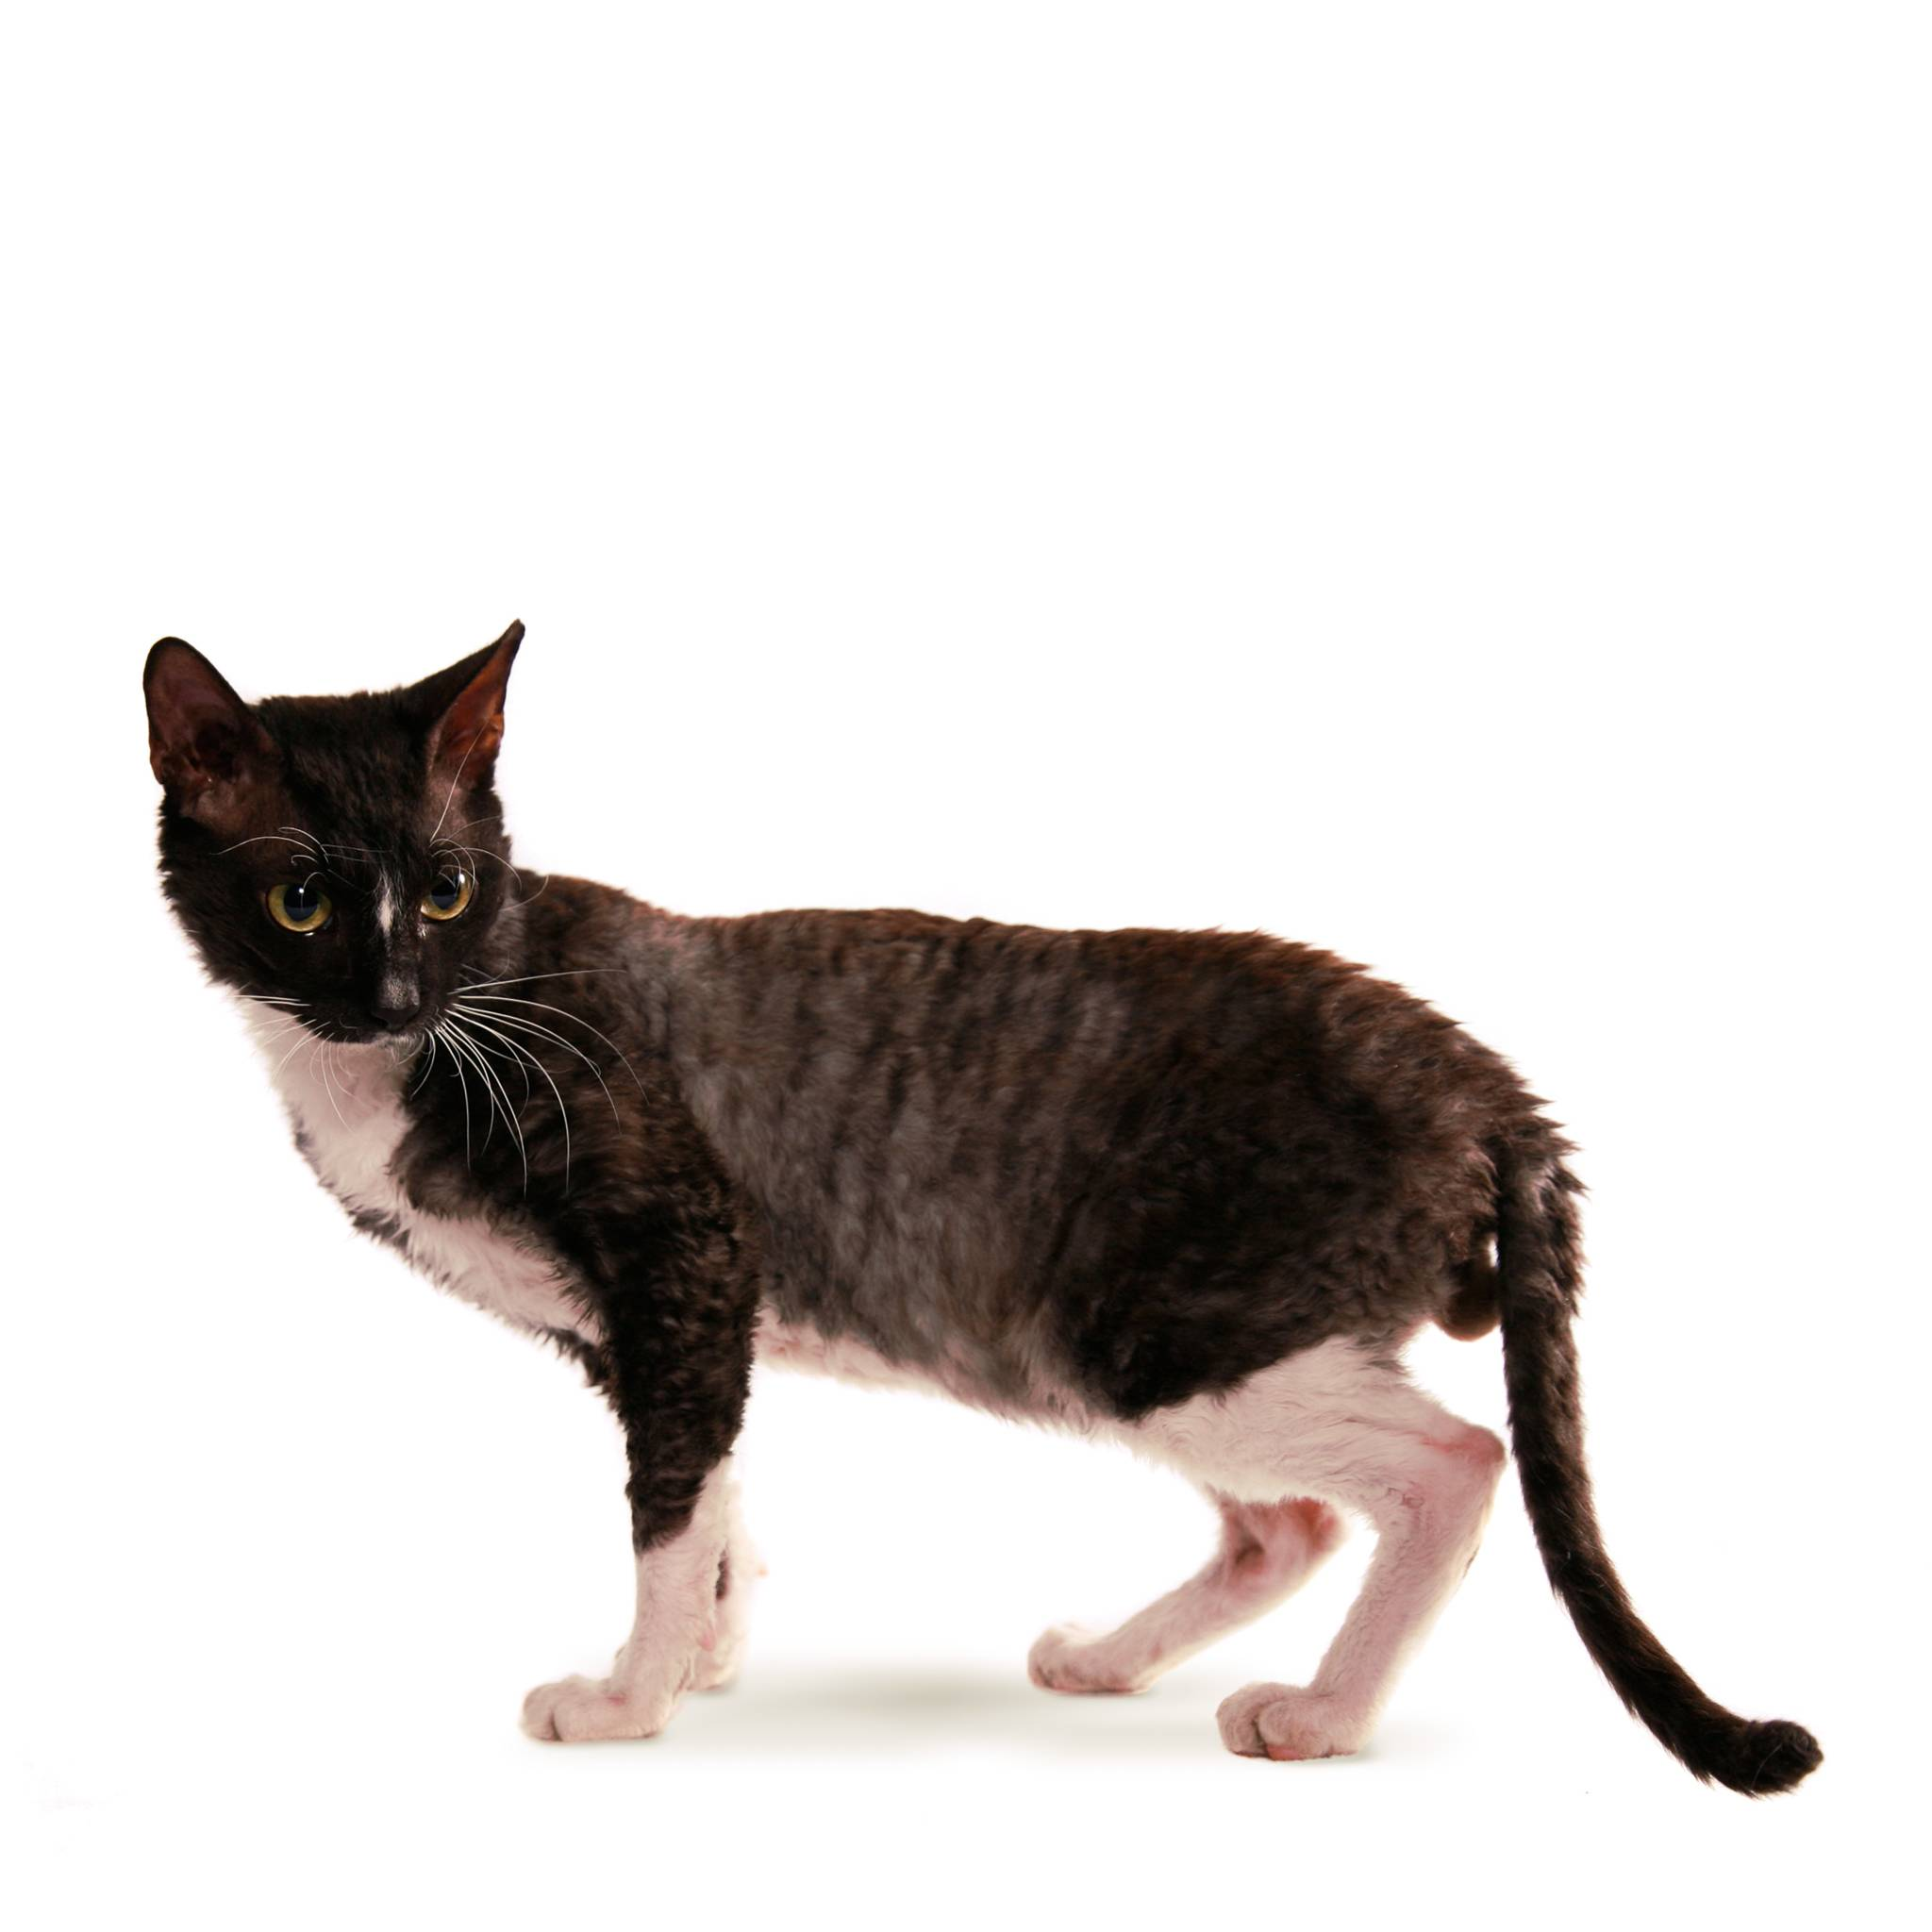 Корниш рекс: описание породы, характер, 30 фото, вобор котенка